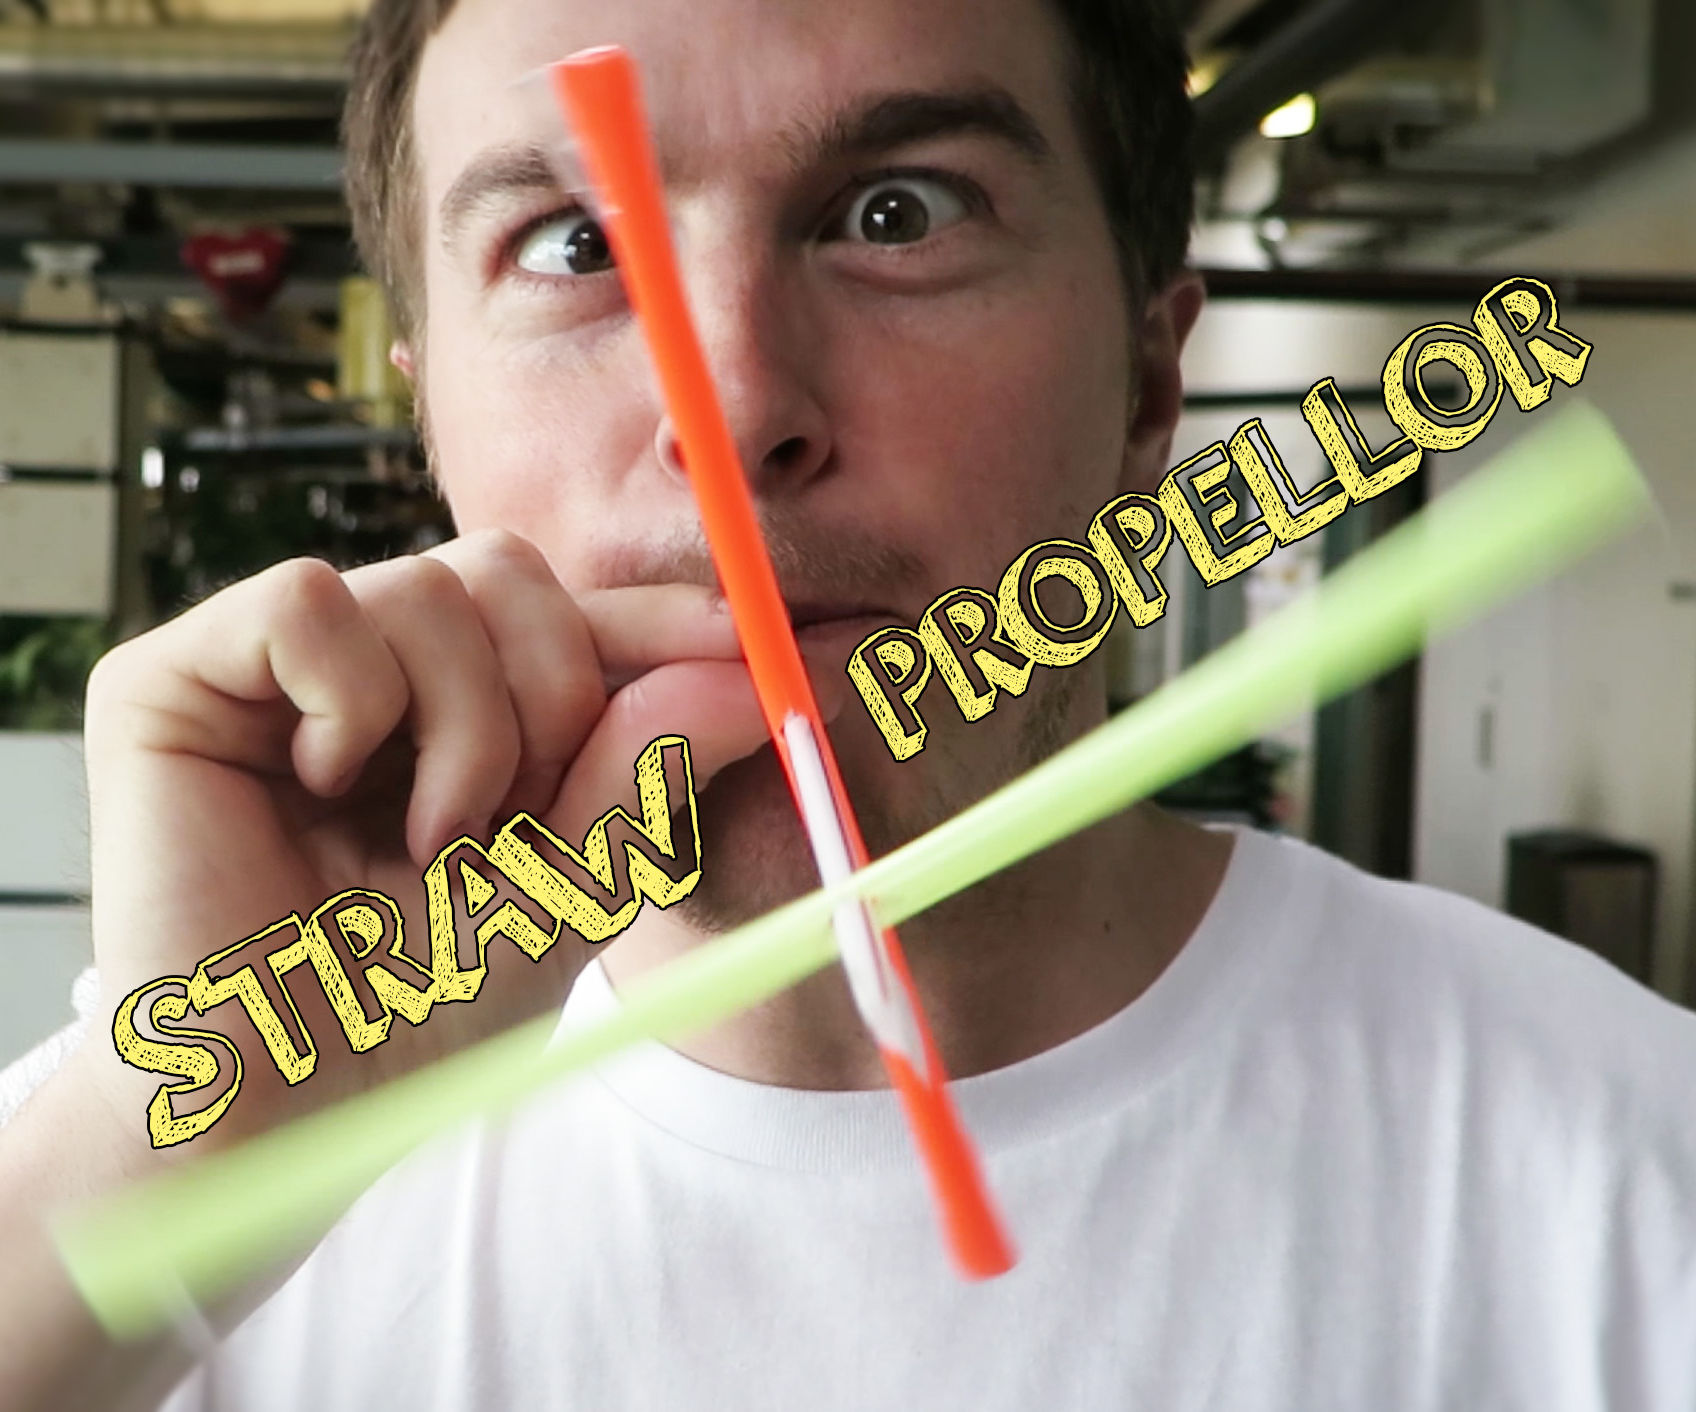 Straw Propellor